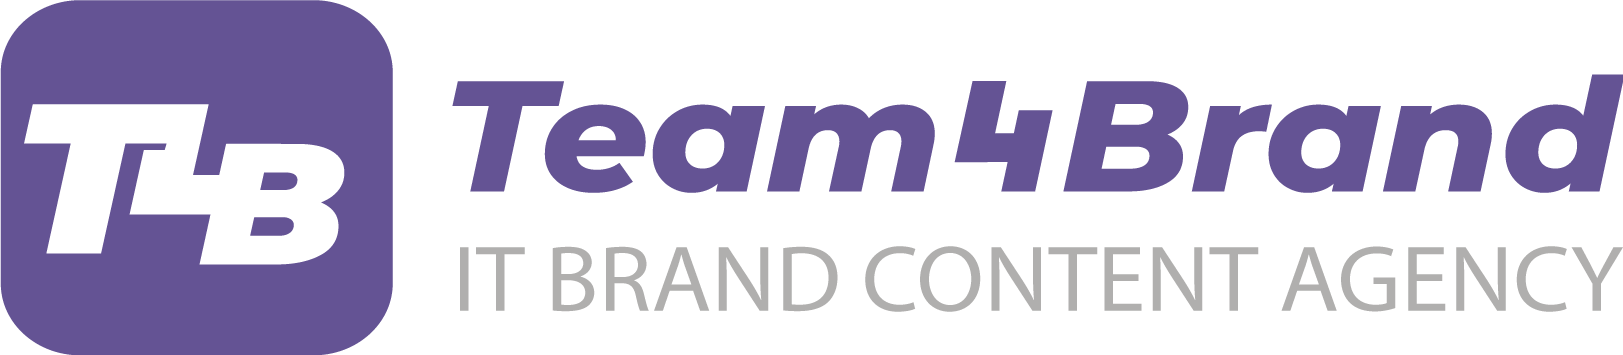 Team4brand